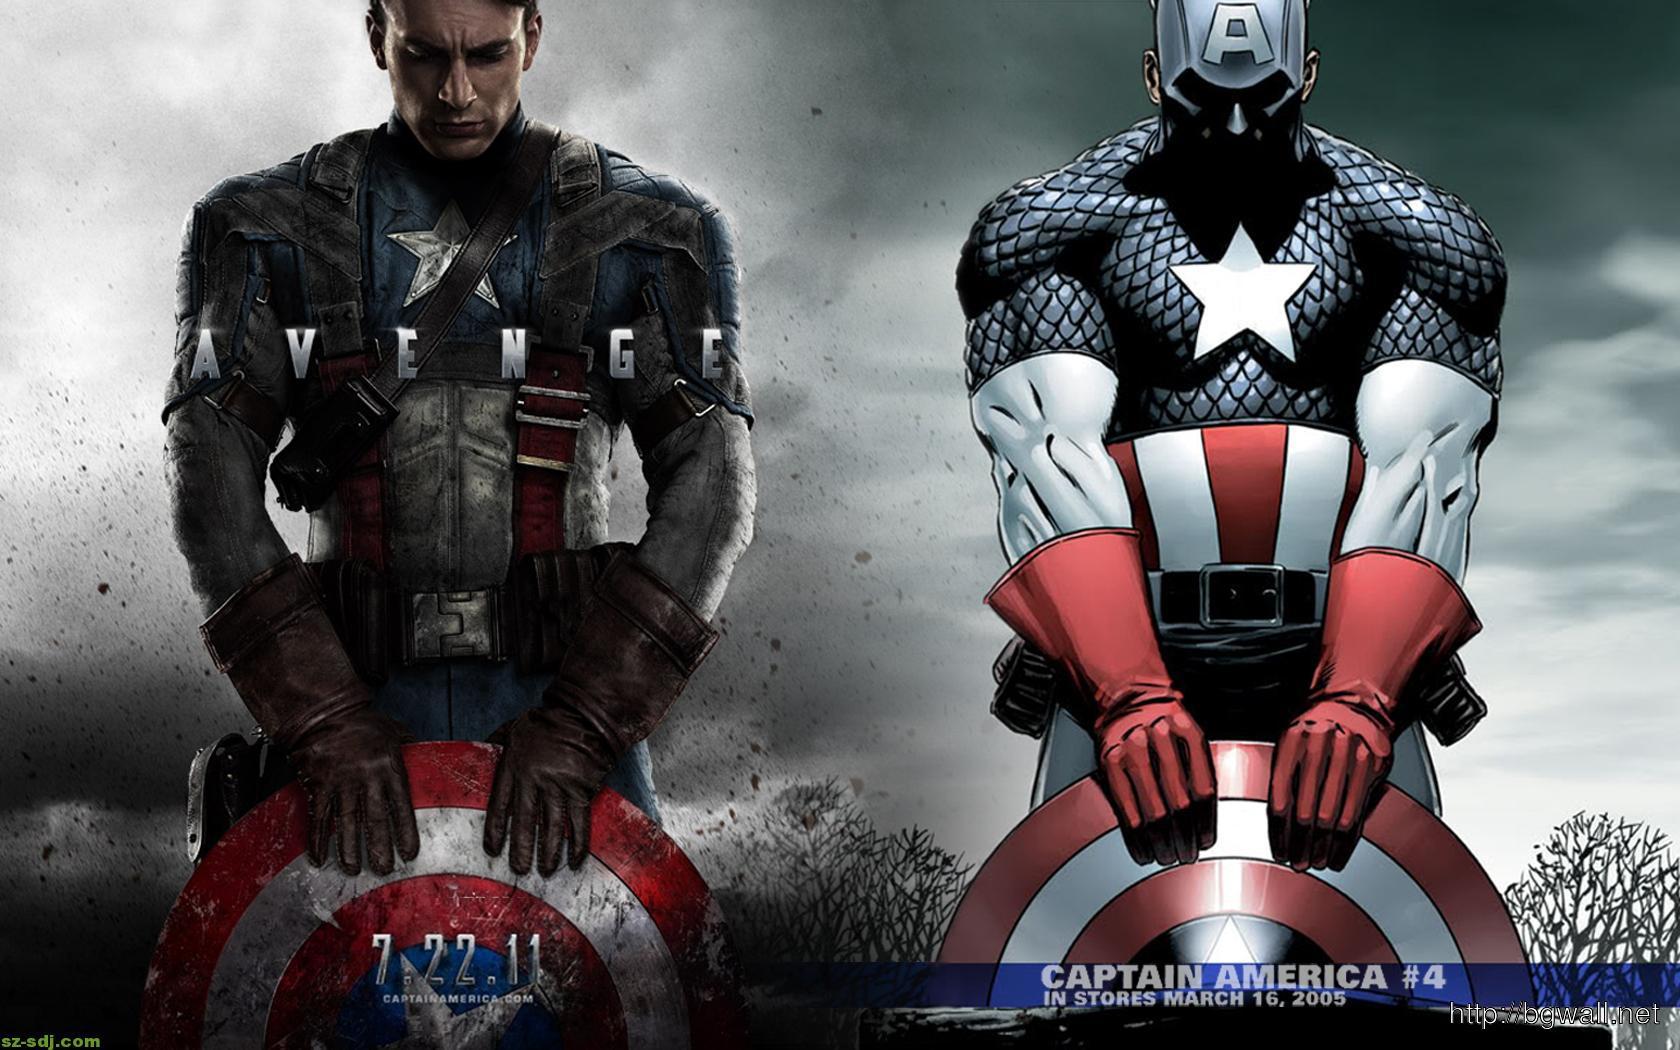 captain-america-movie-and-comics-wallpaper-image-hd